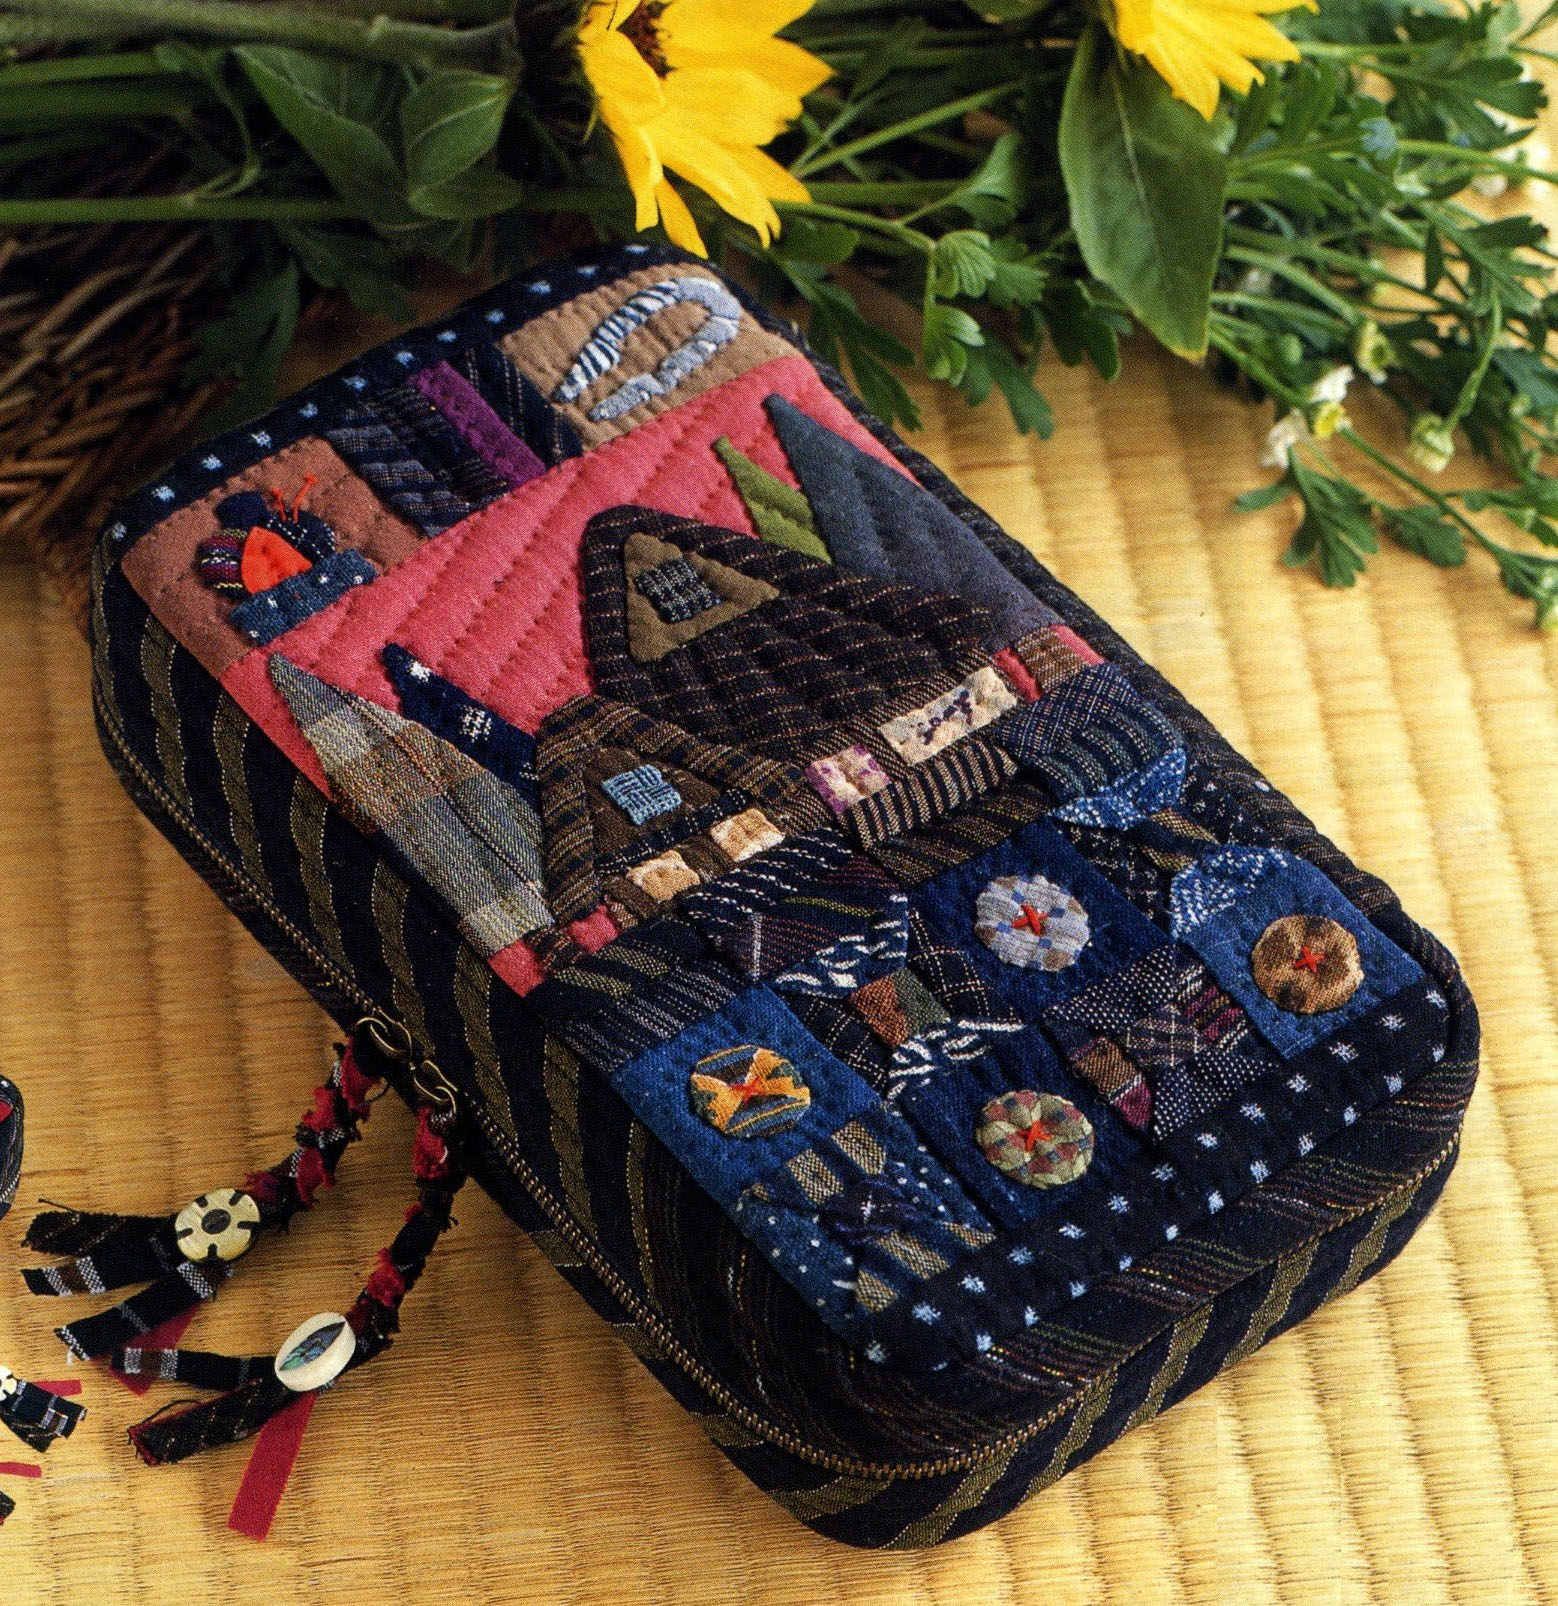 Sewing Case ソーイングボックス